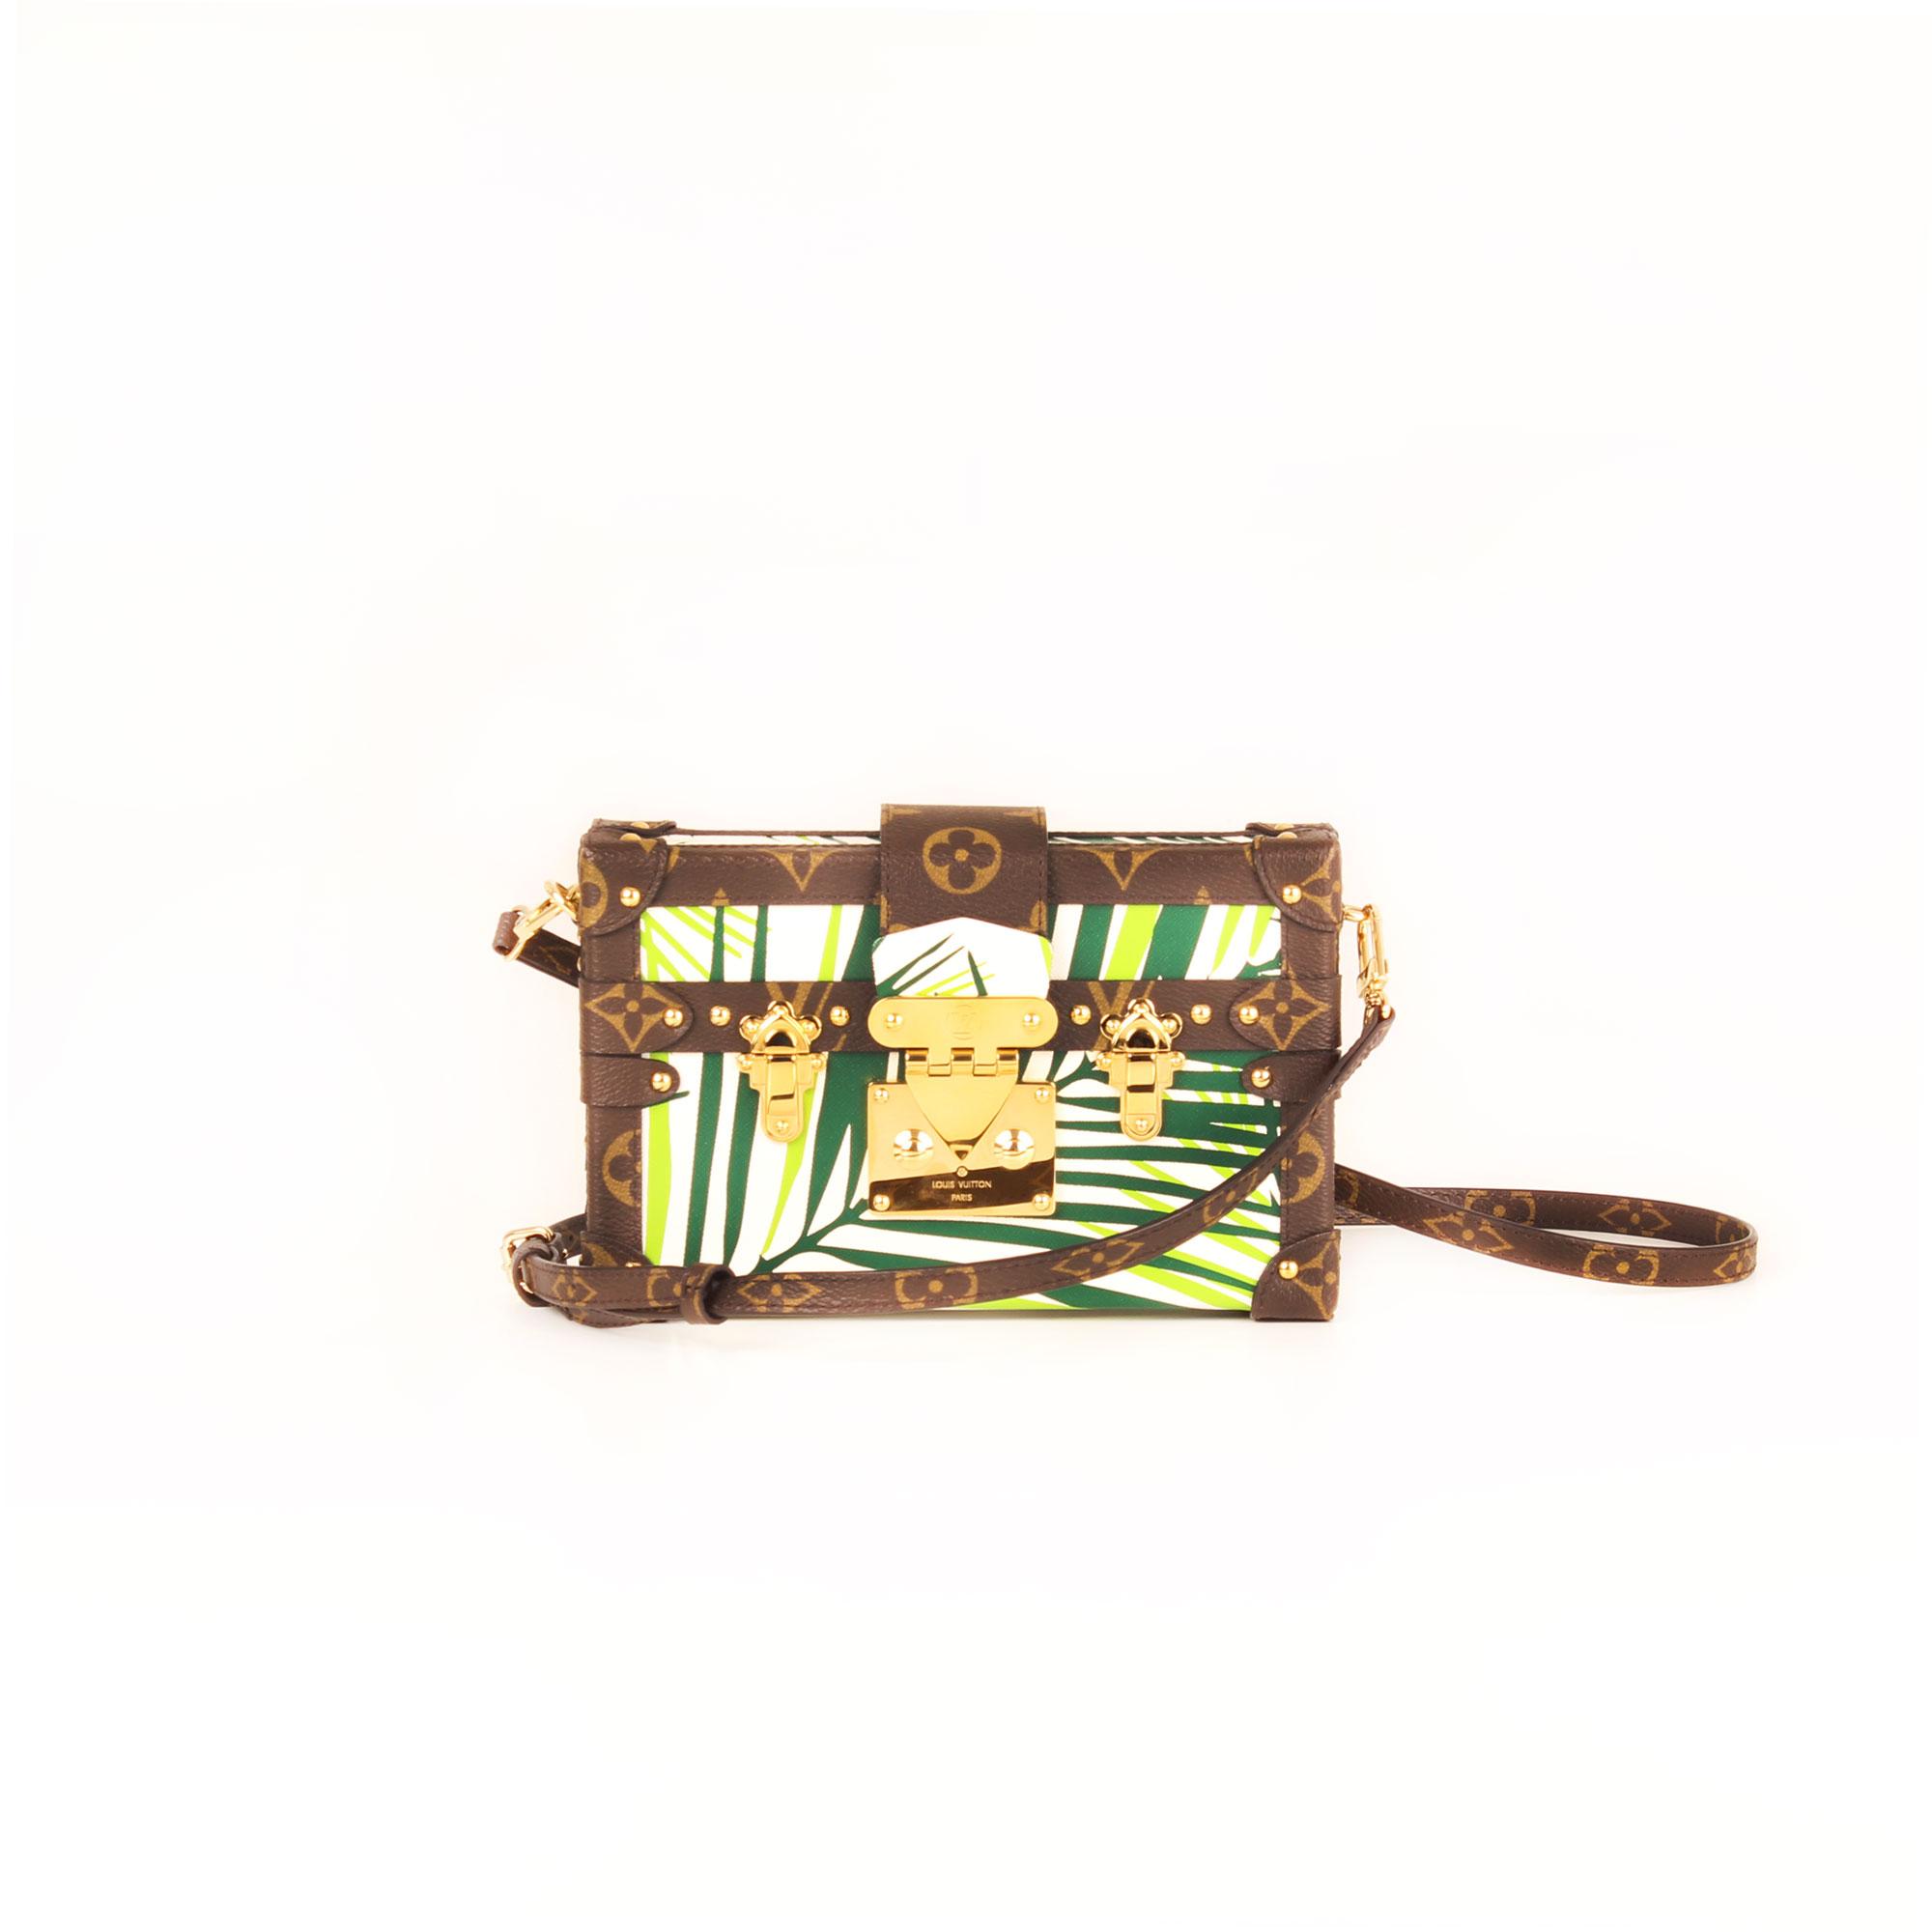 Imagen frontal del bolso louis vuitton petite malle